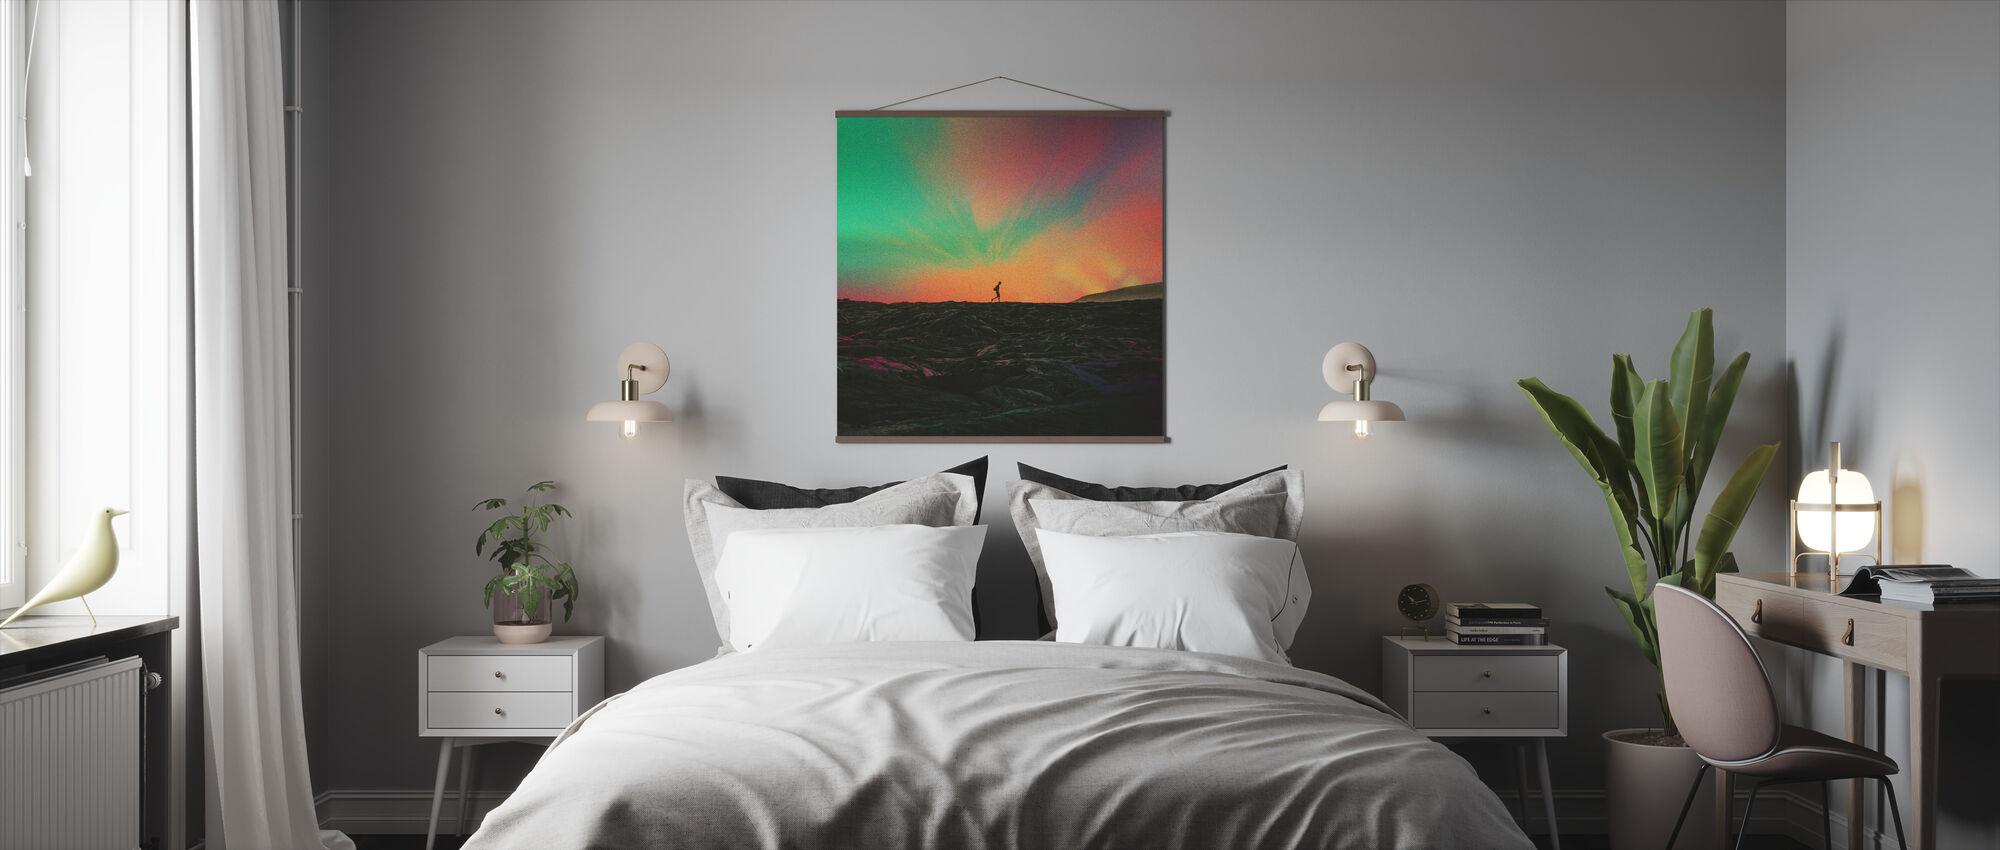 Zwerver - Poster - Slaapkamer